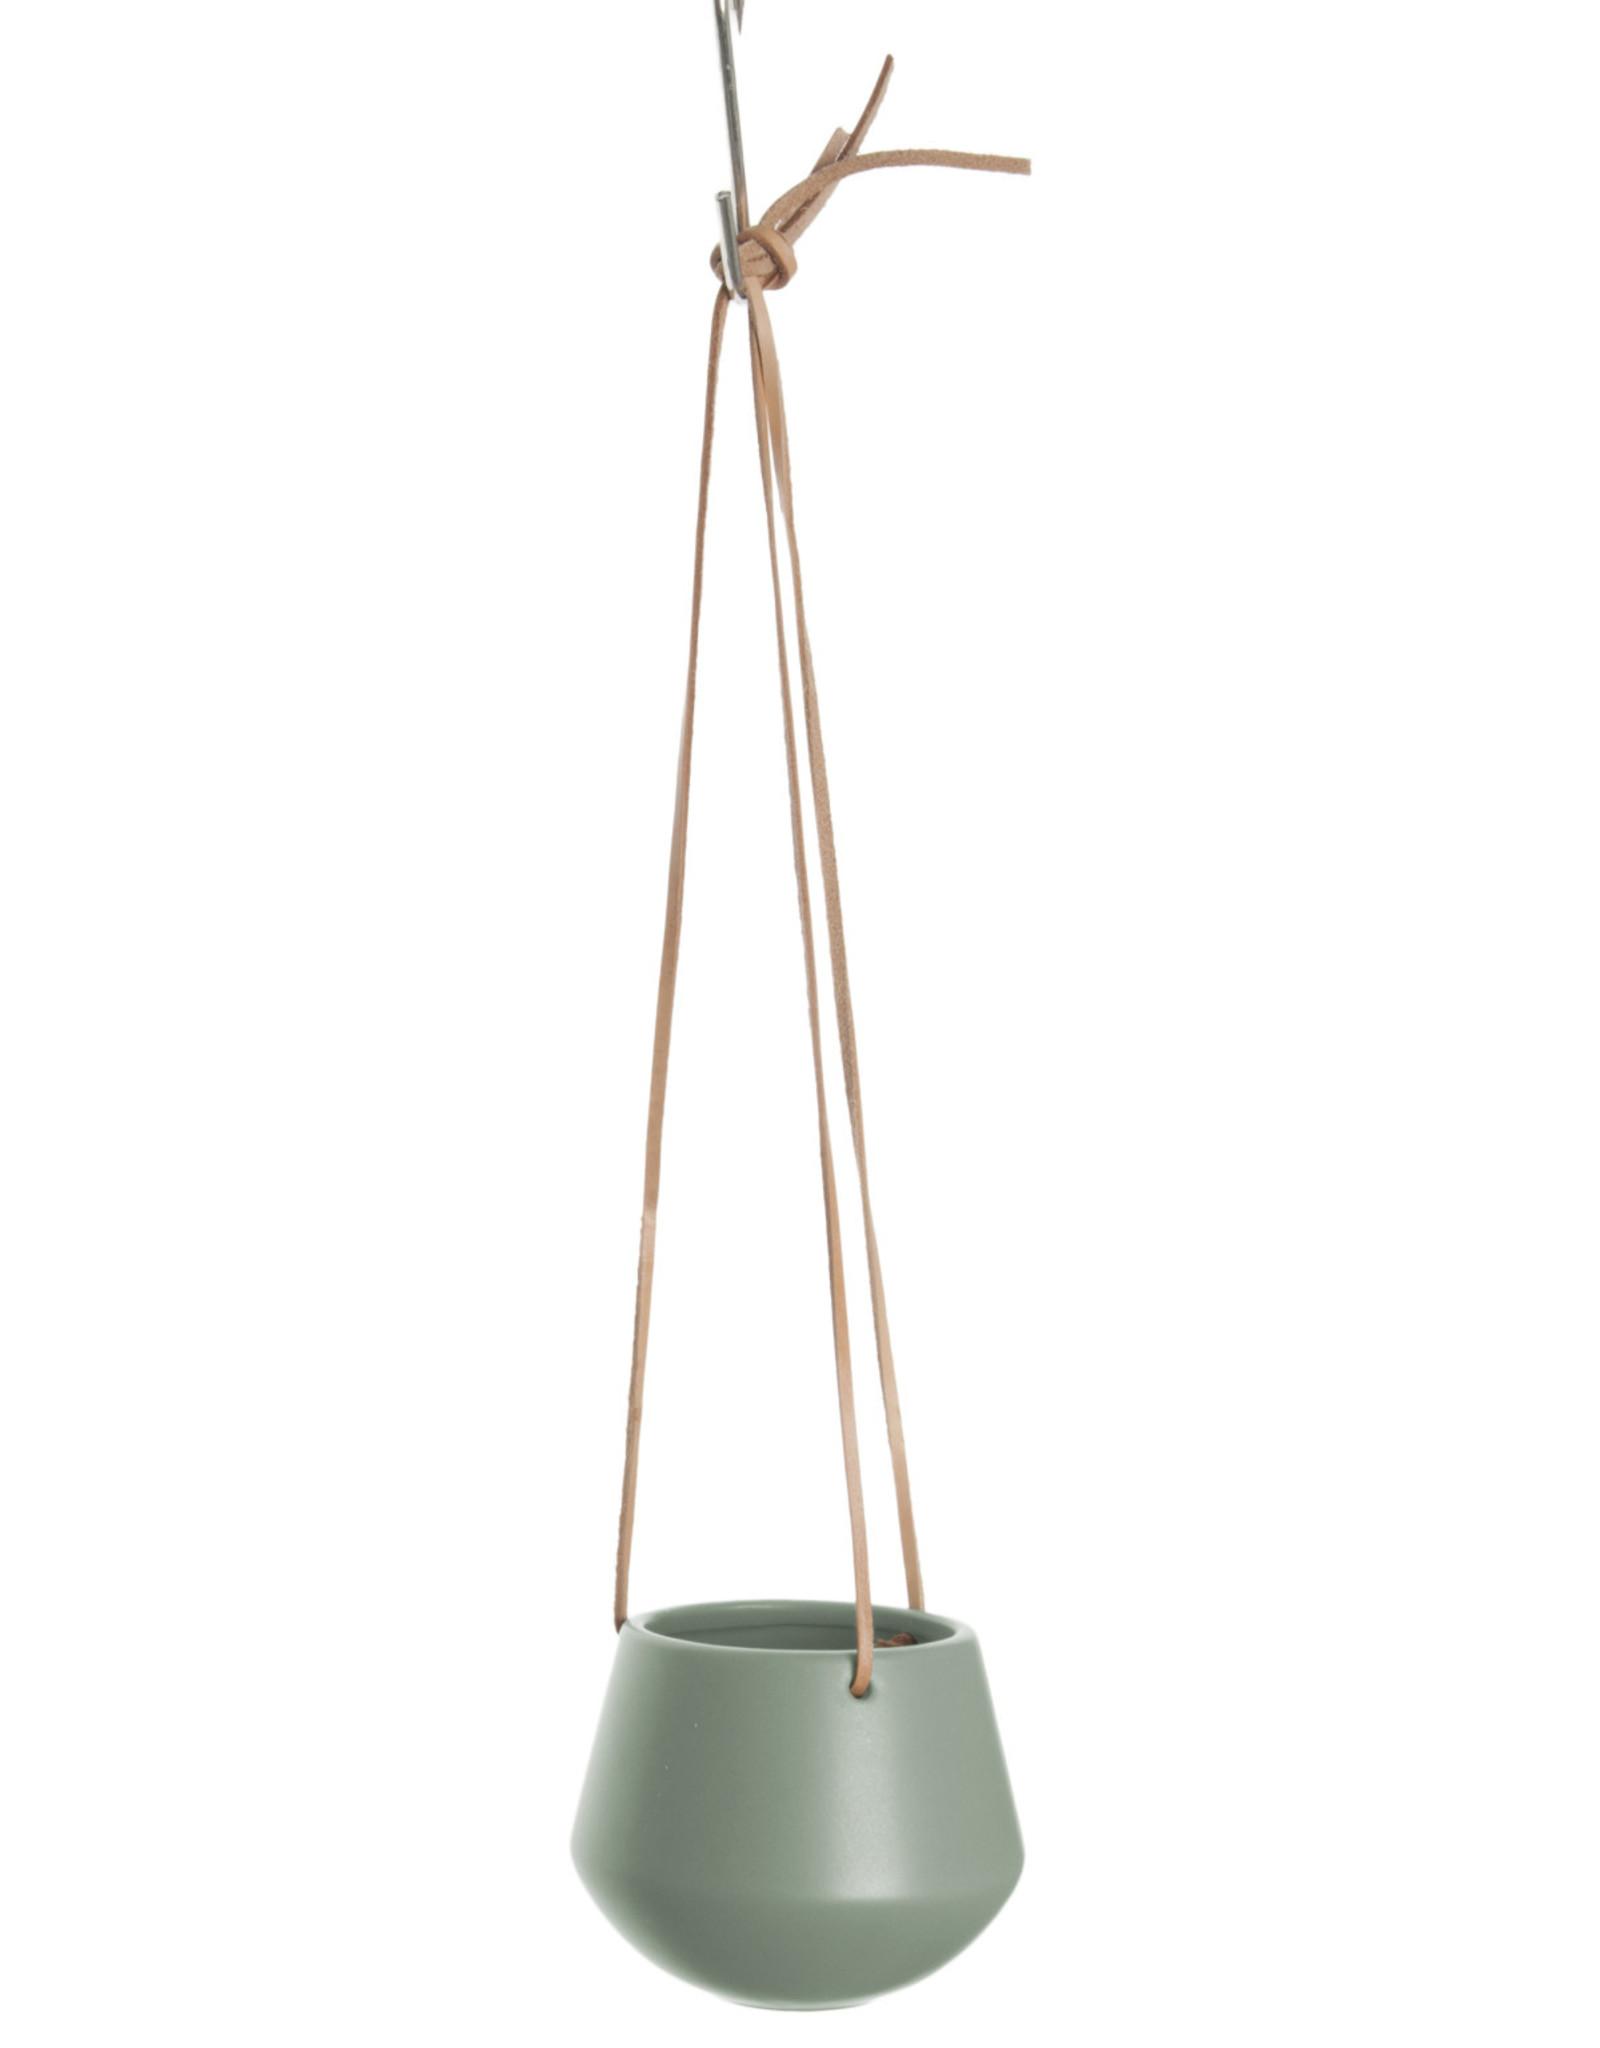 pt Skittle hangpot  Ø12 cm, lengte 66 cm - Jungle groen